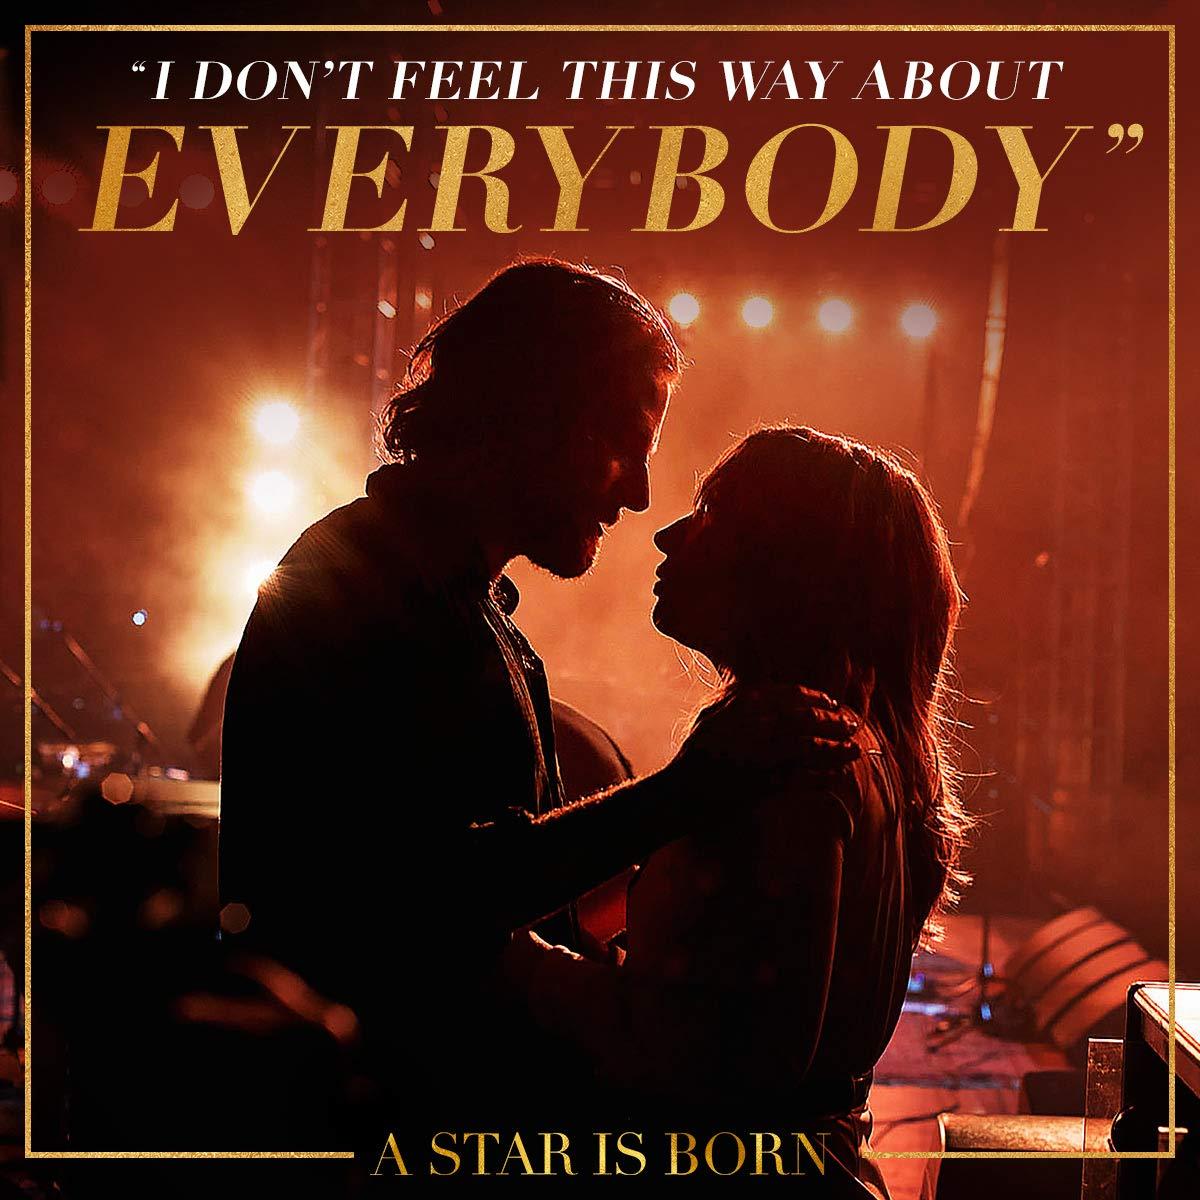 Amazon in: Buy A Star is Born (2018) (4K UHD & HD) DVD, Blu-ray